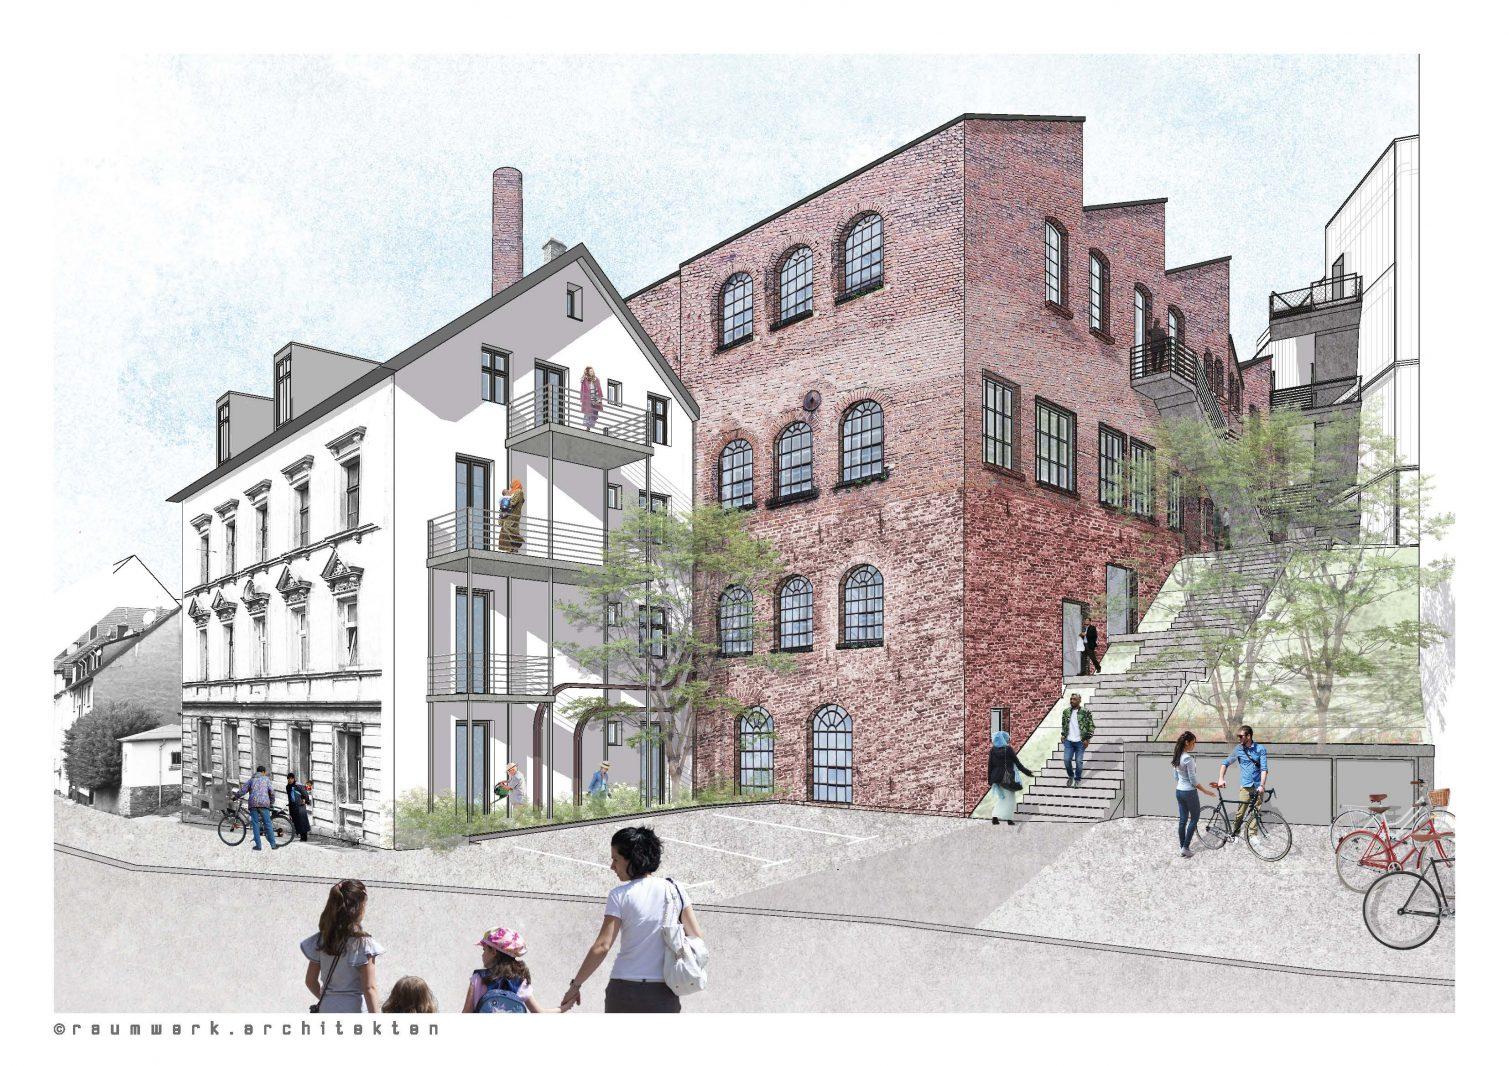 Grafik: raumwerk.architekten, (C) Urbane Nachbarschaft BOB gGmbH